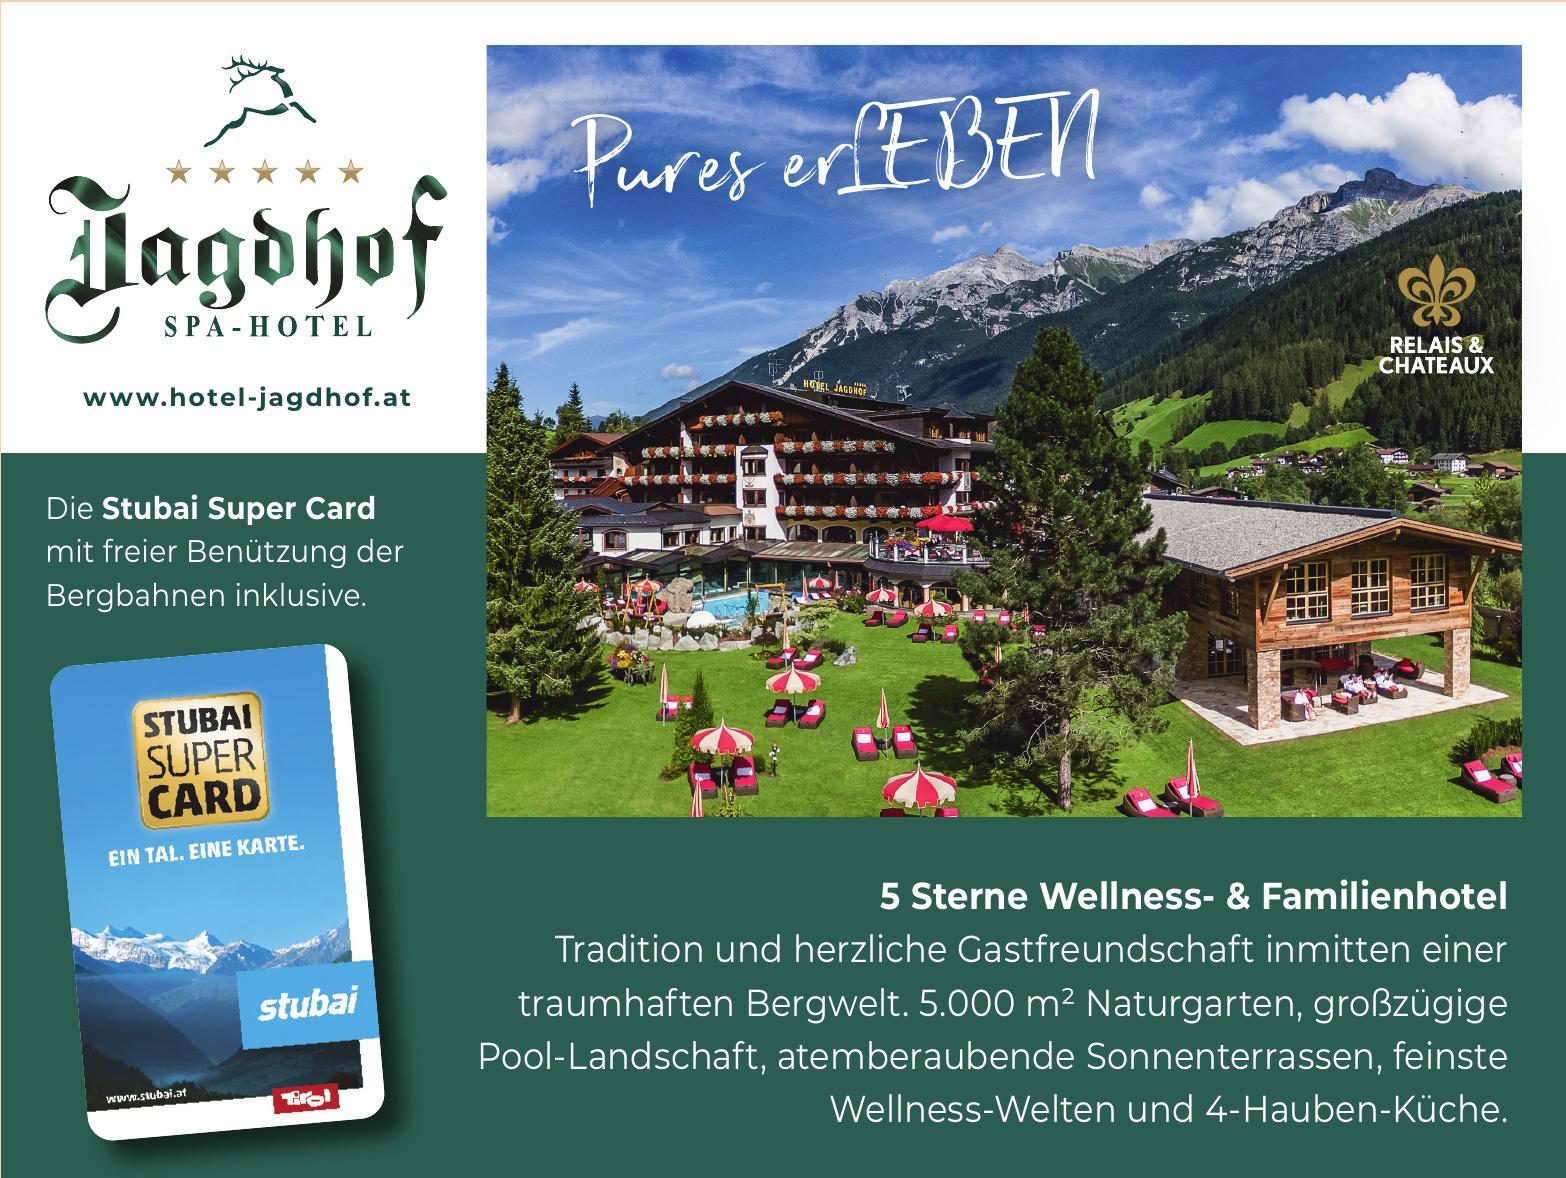 Jagdhof - Spa-Hotel